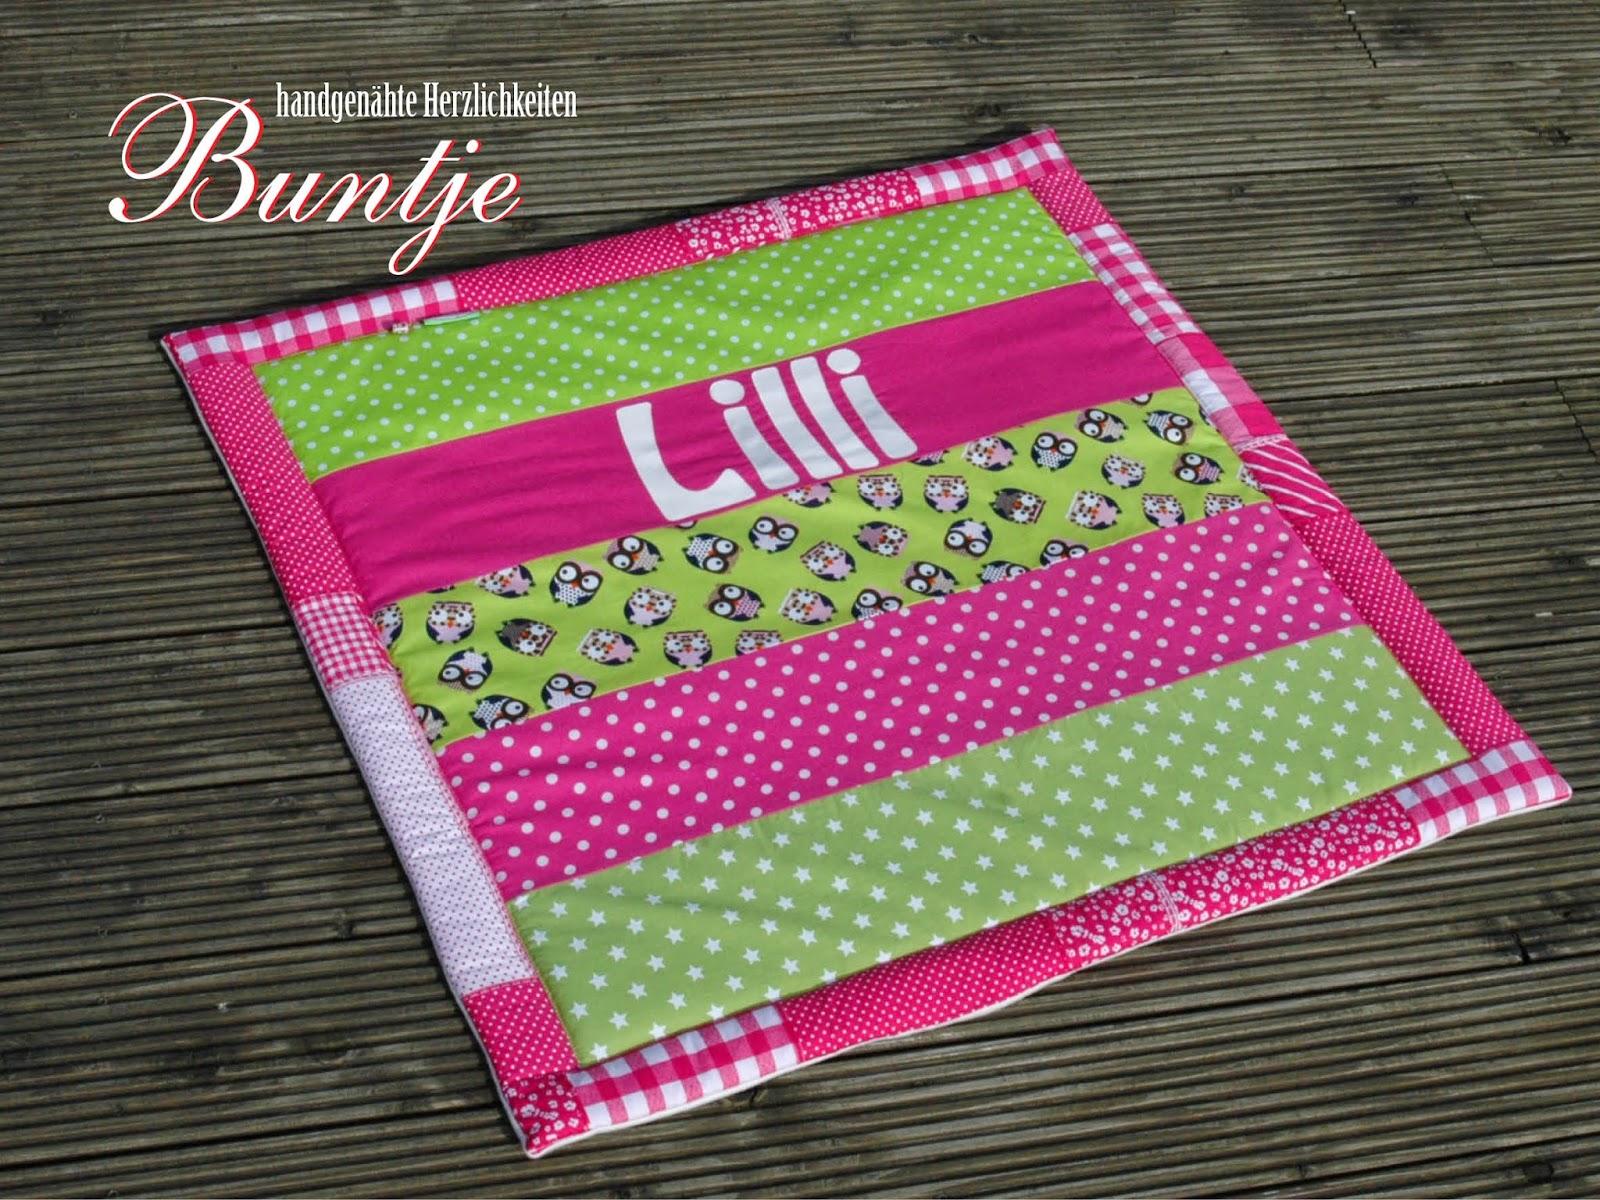 Krabbeldecke Kuscheldecke Decke Baby Name Geschenk Geburt Taufe Mädchen pink grün Eulen Lilli Fleece Baumwolle Buntje nähen